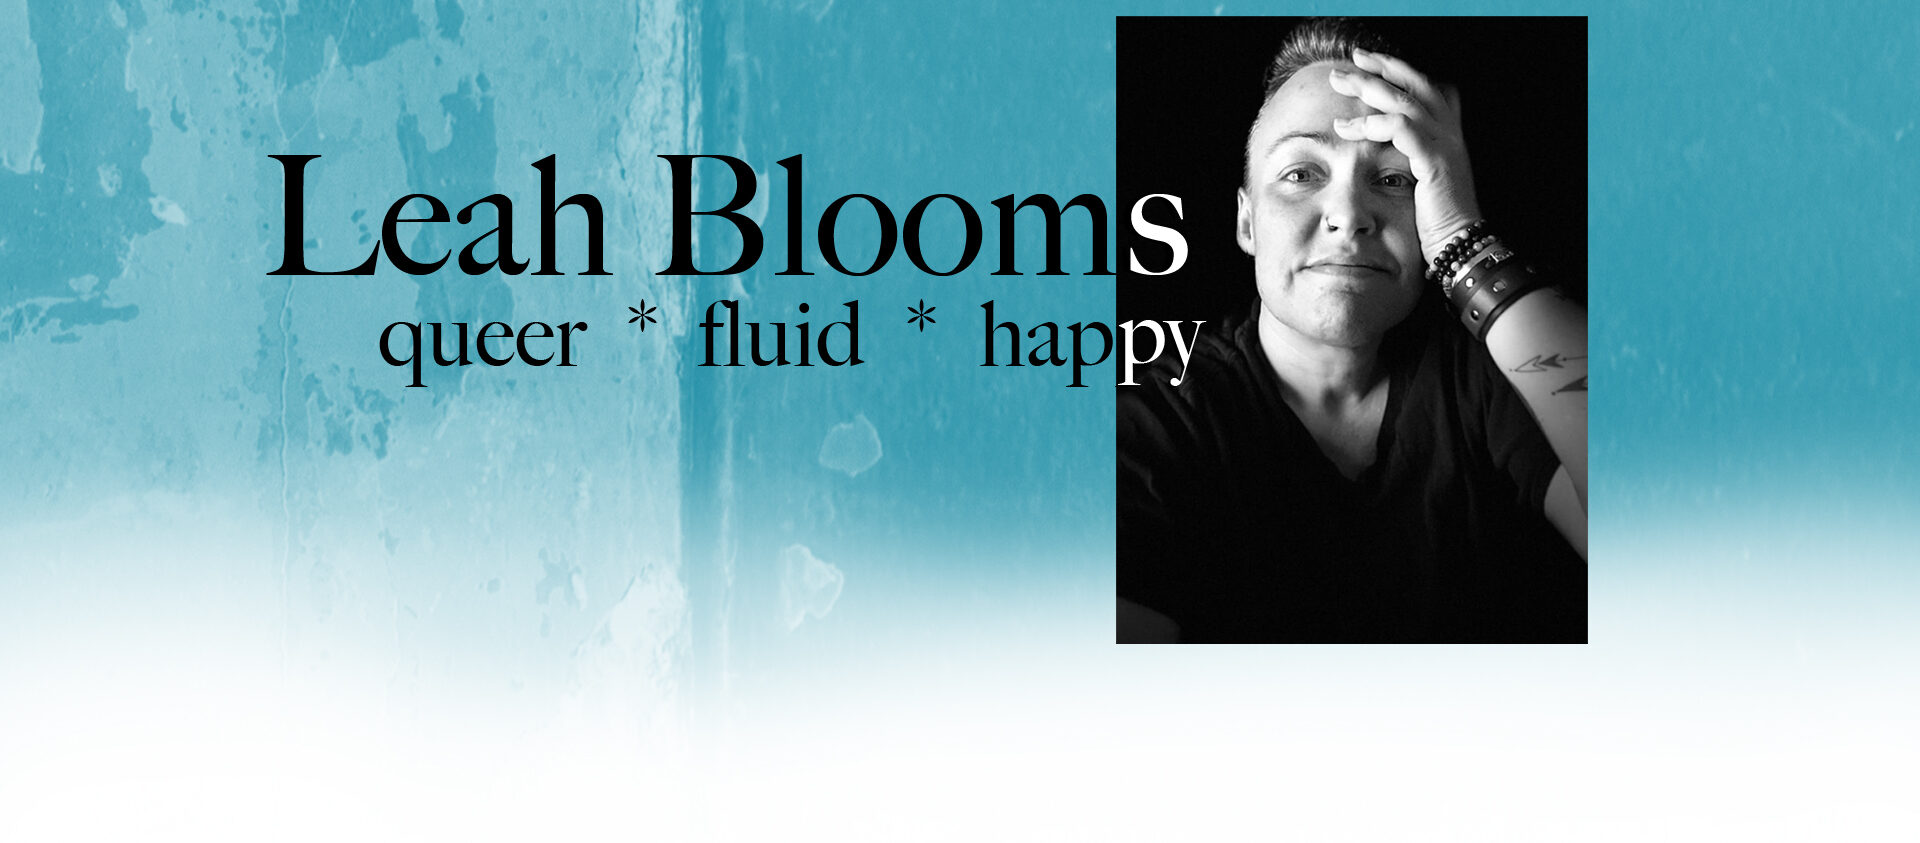 Leah Blooms